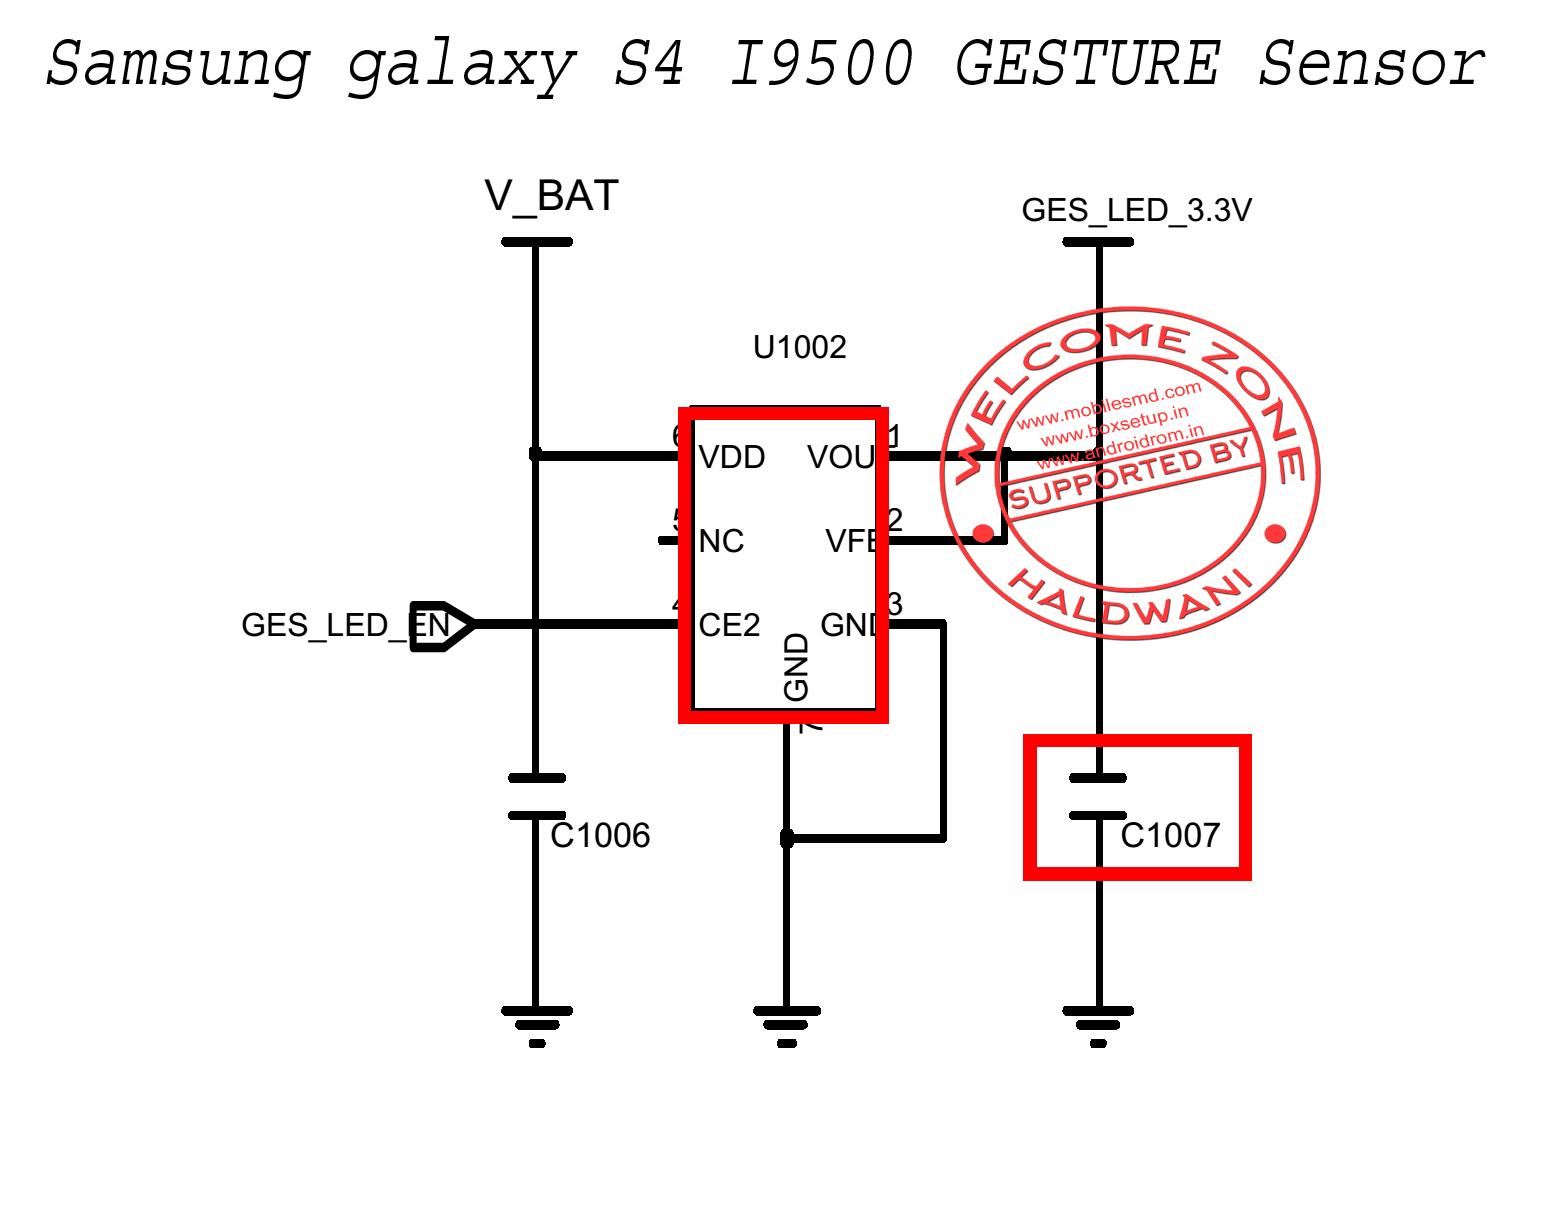 Samsung Galaxy S4 I9500 Gesture Sensor Not Working Solution